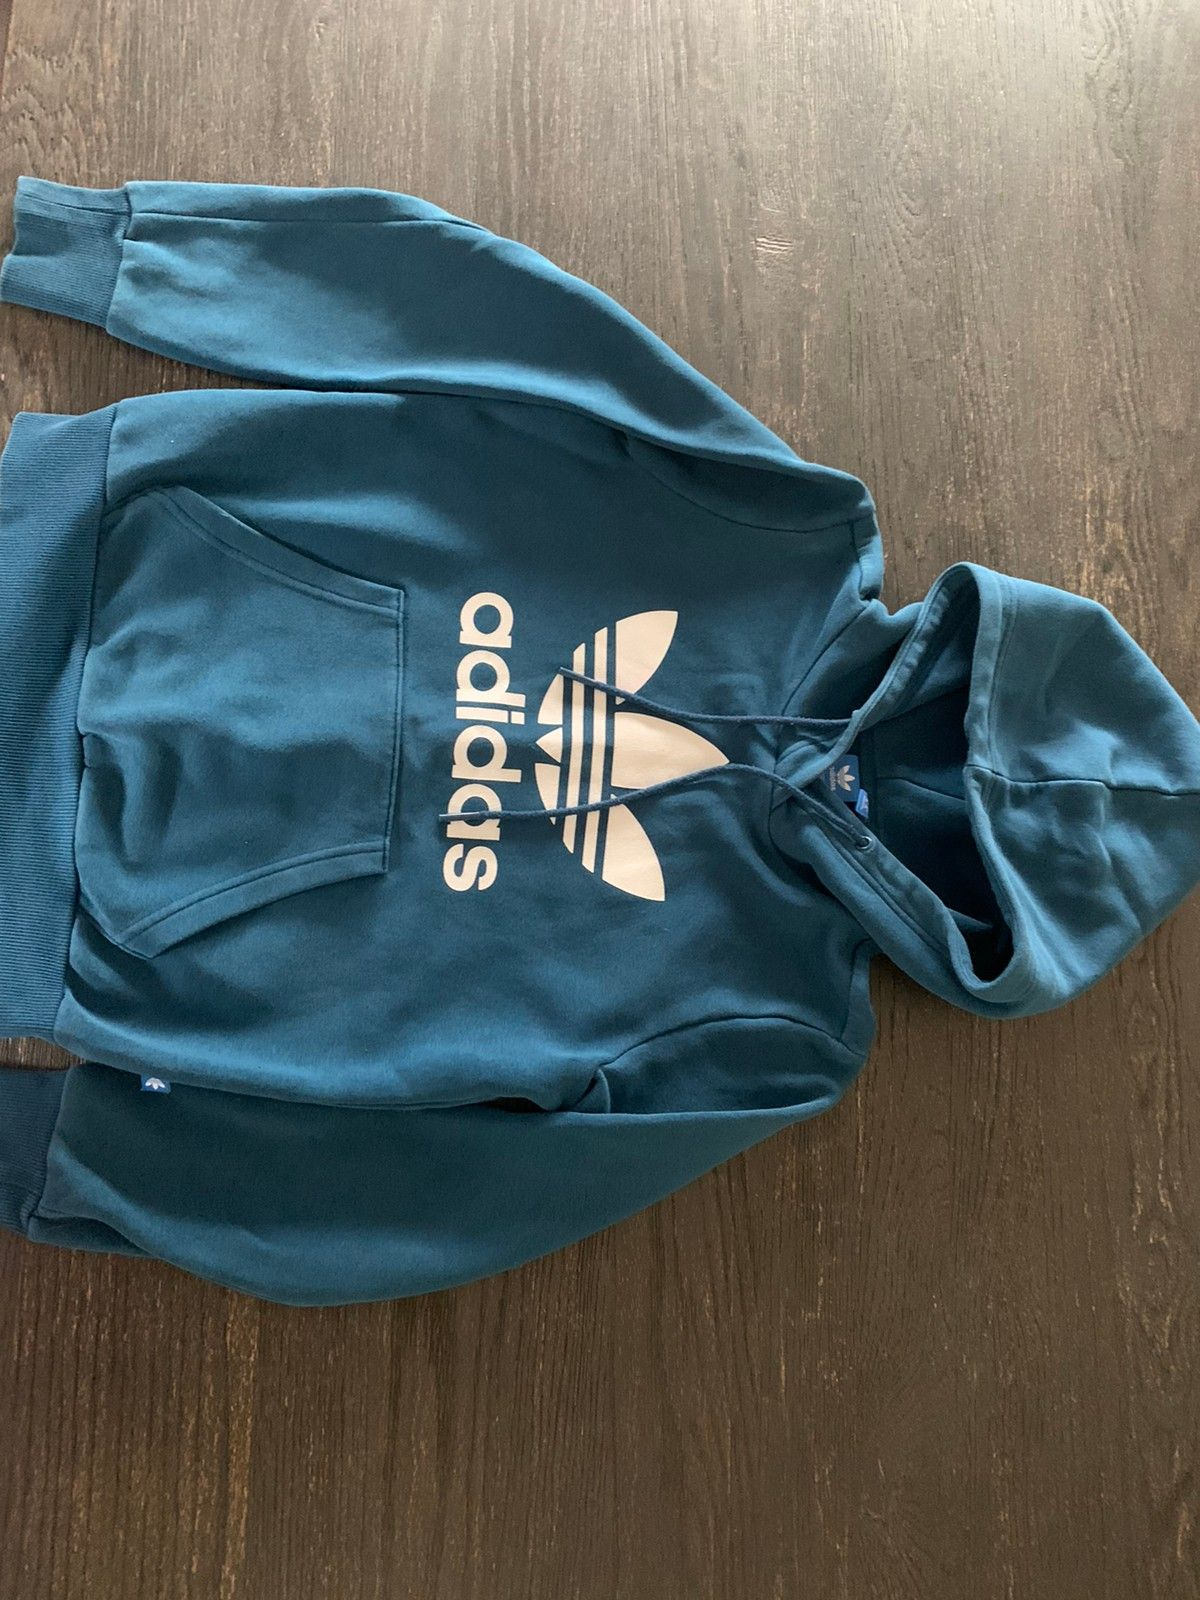 Adidas kort jakke | FINN.no